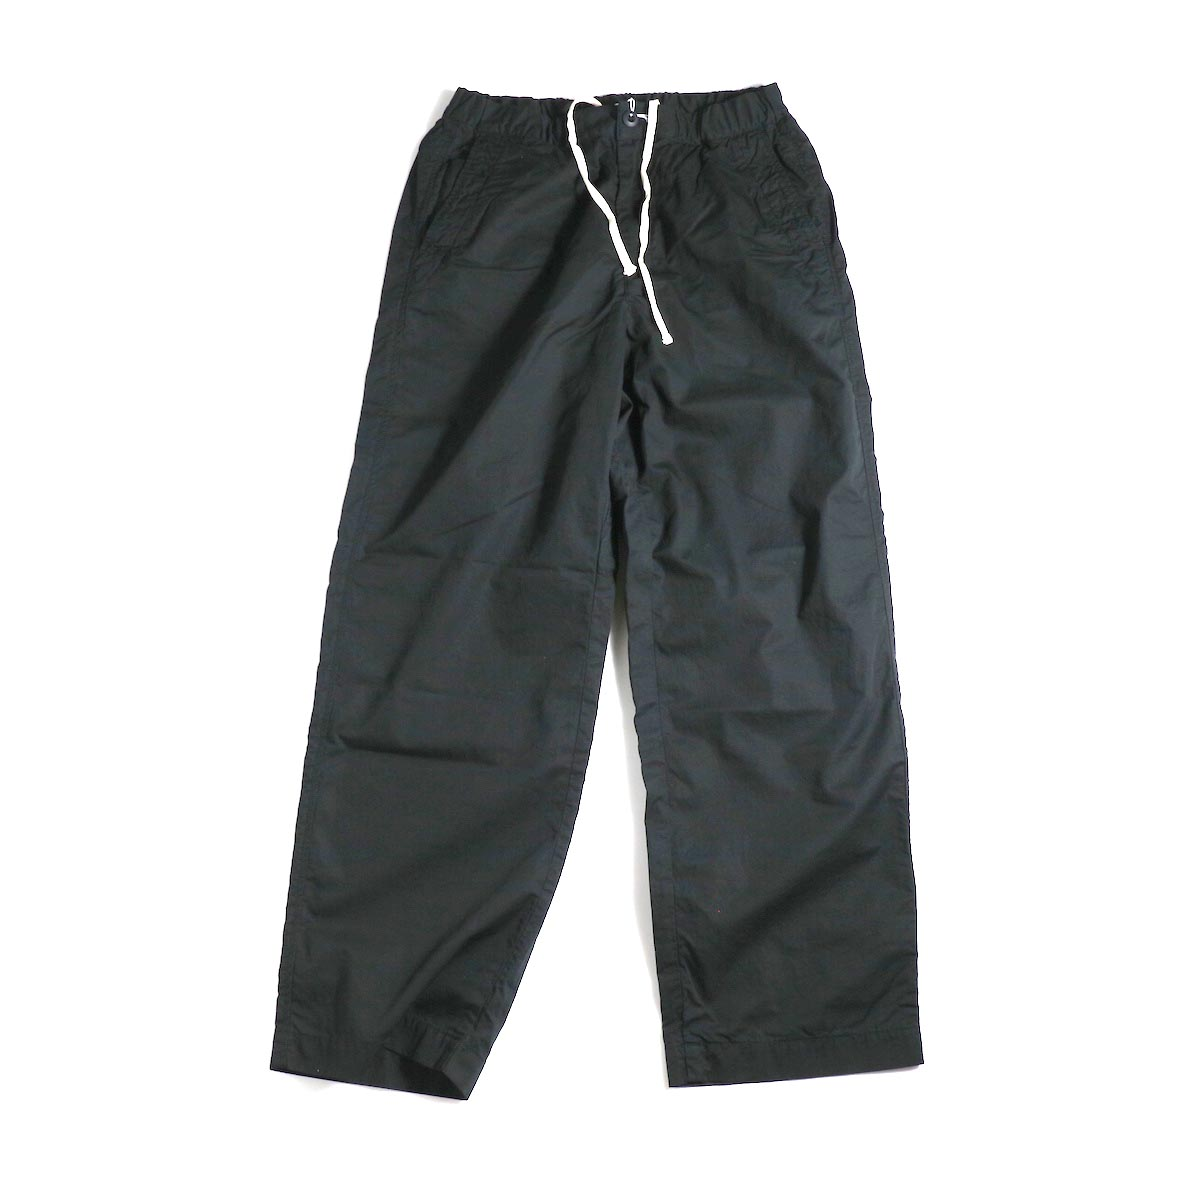 BRENA / Cotton&Linen Washer Kersey Coq Pants (Black)